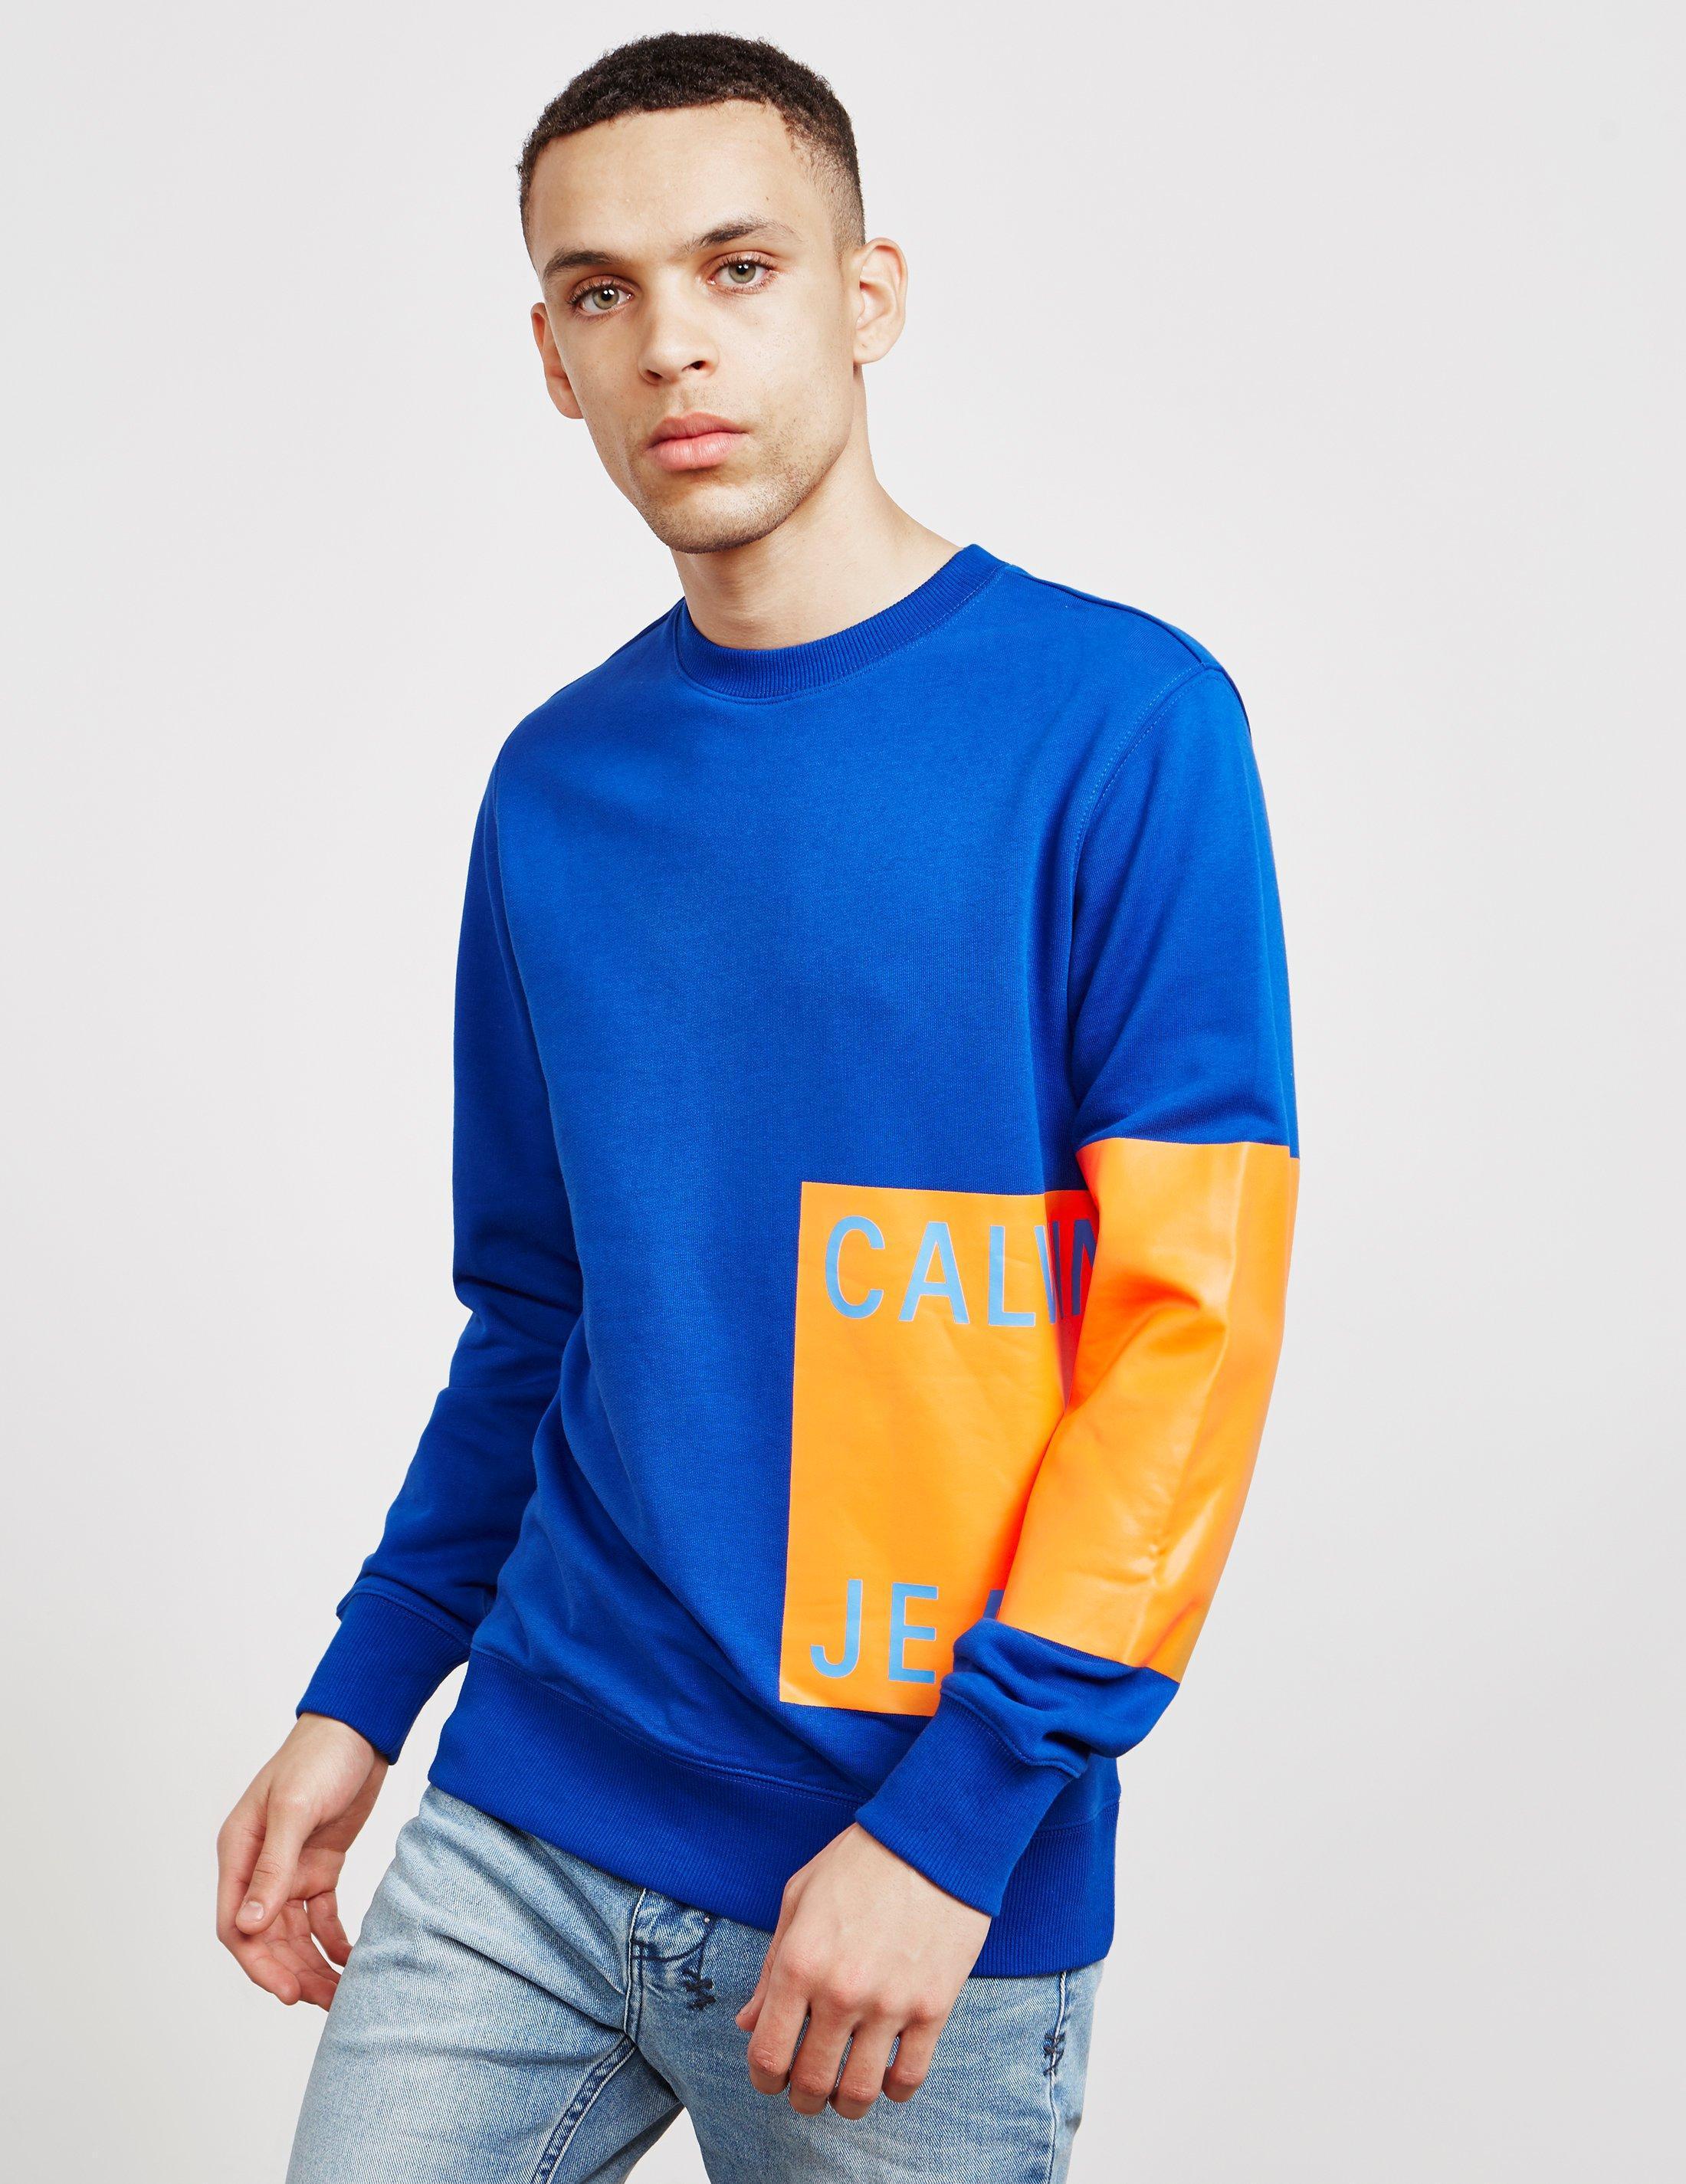 d2b37f698 Lyst - Calvin Klein Mens Print Patch Logo Sweatshirt Blue in Blue ...